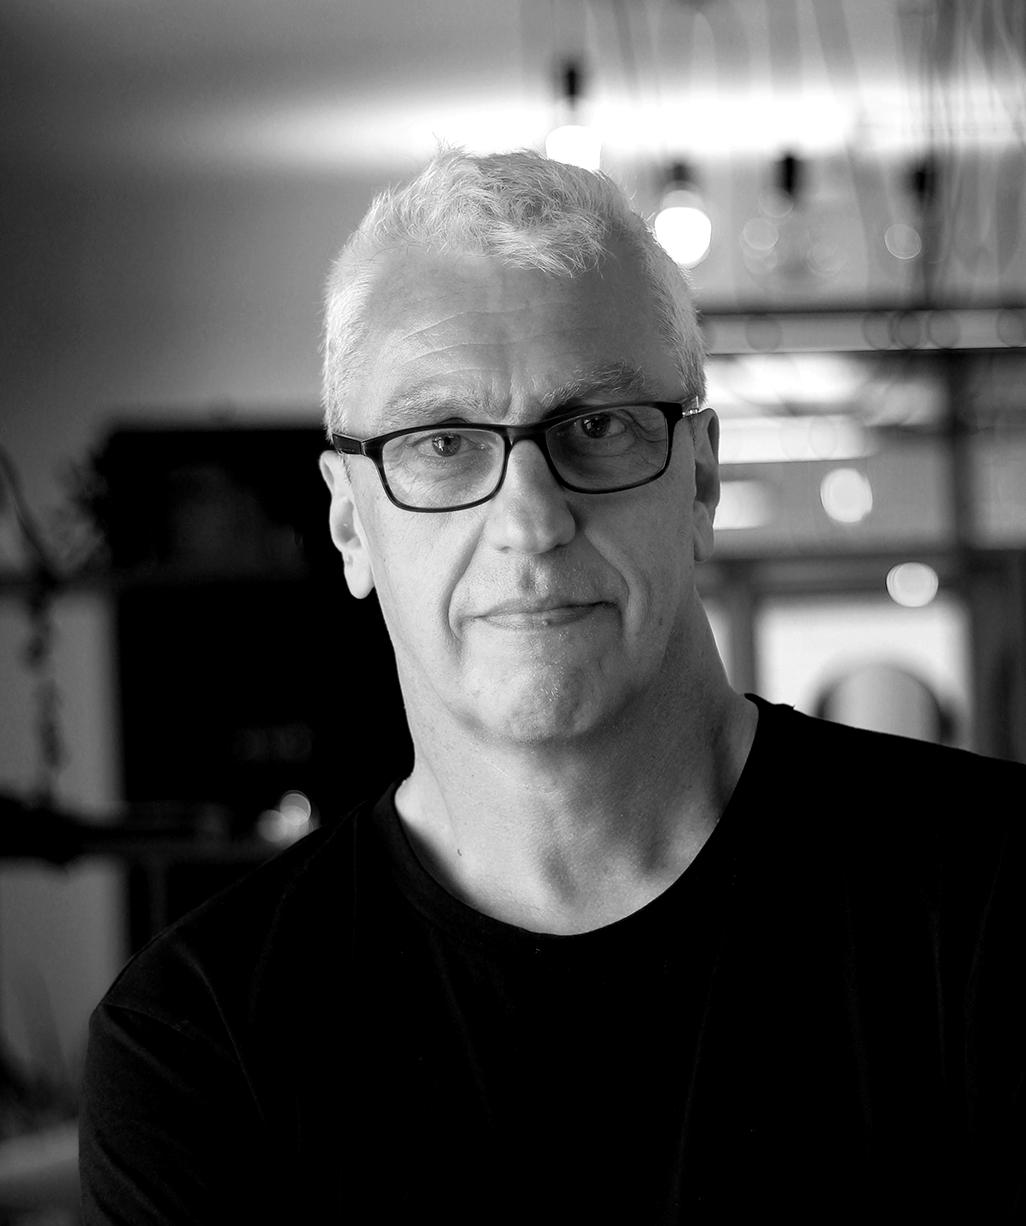 Mark Braun